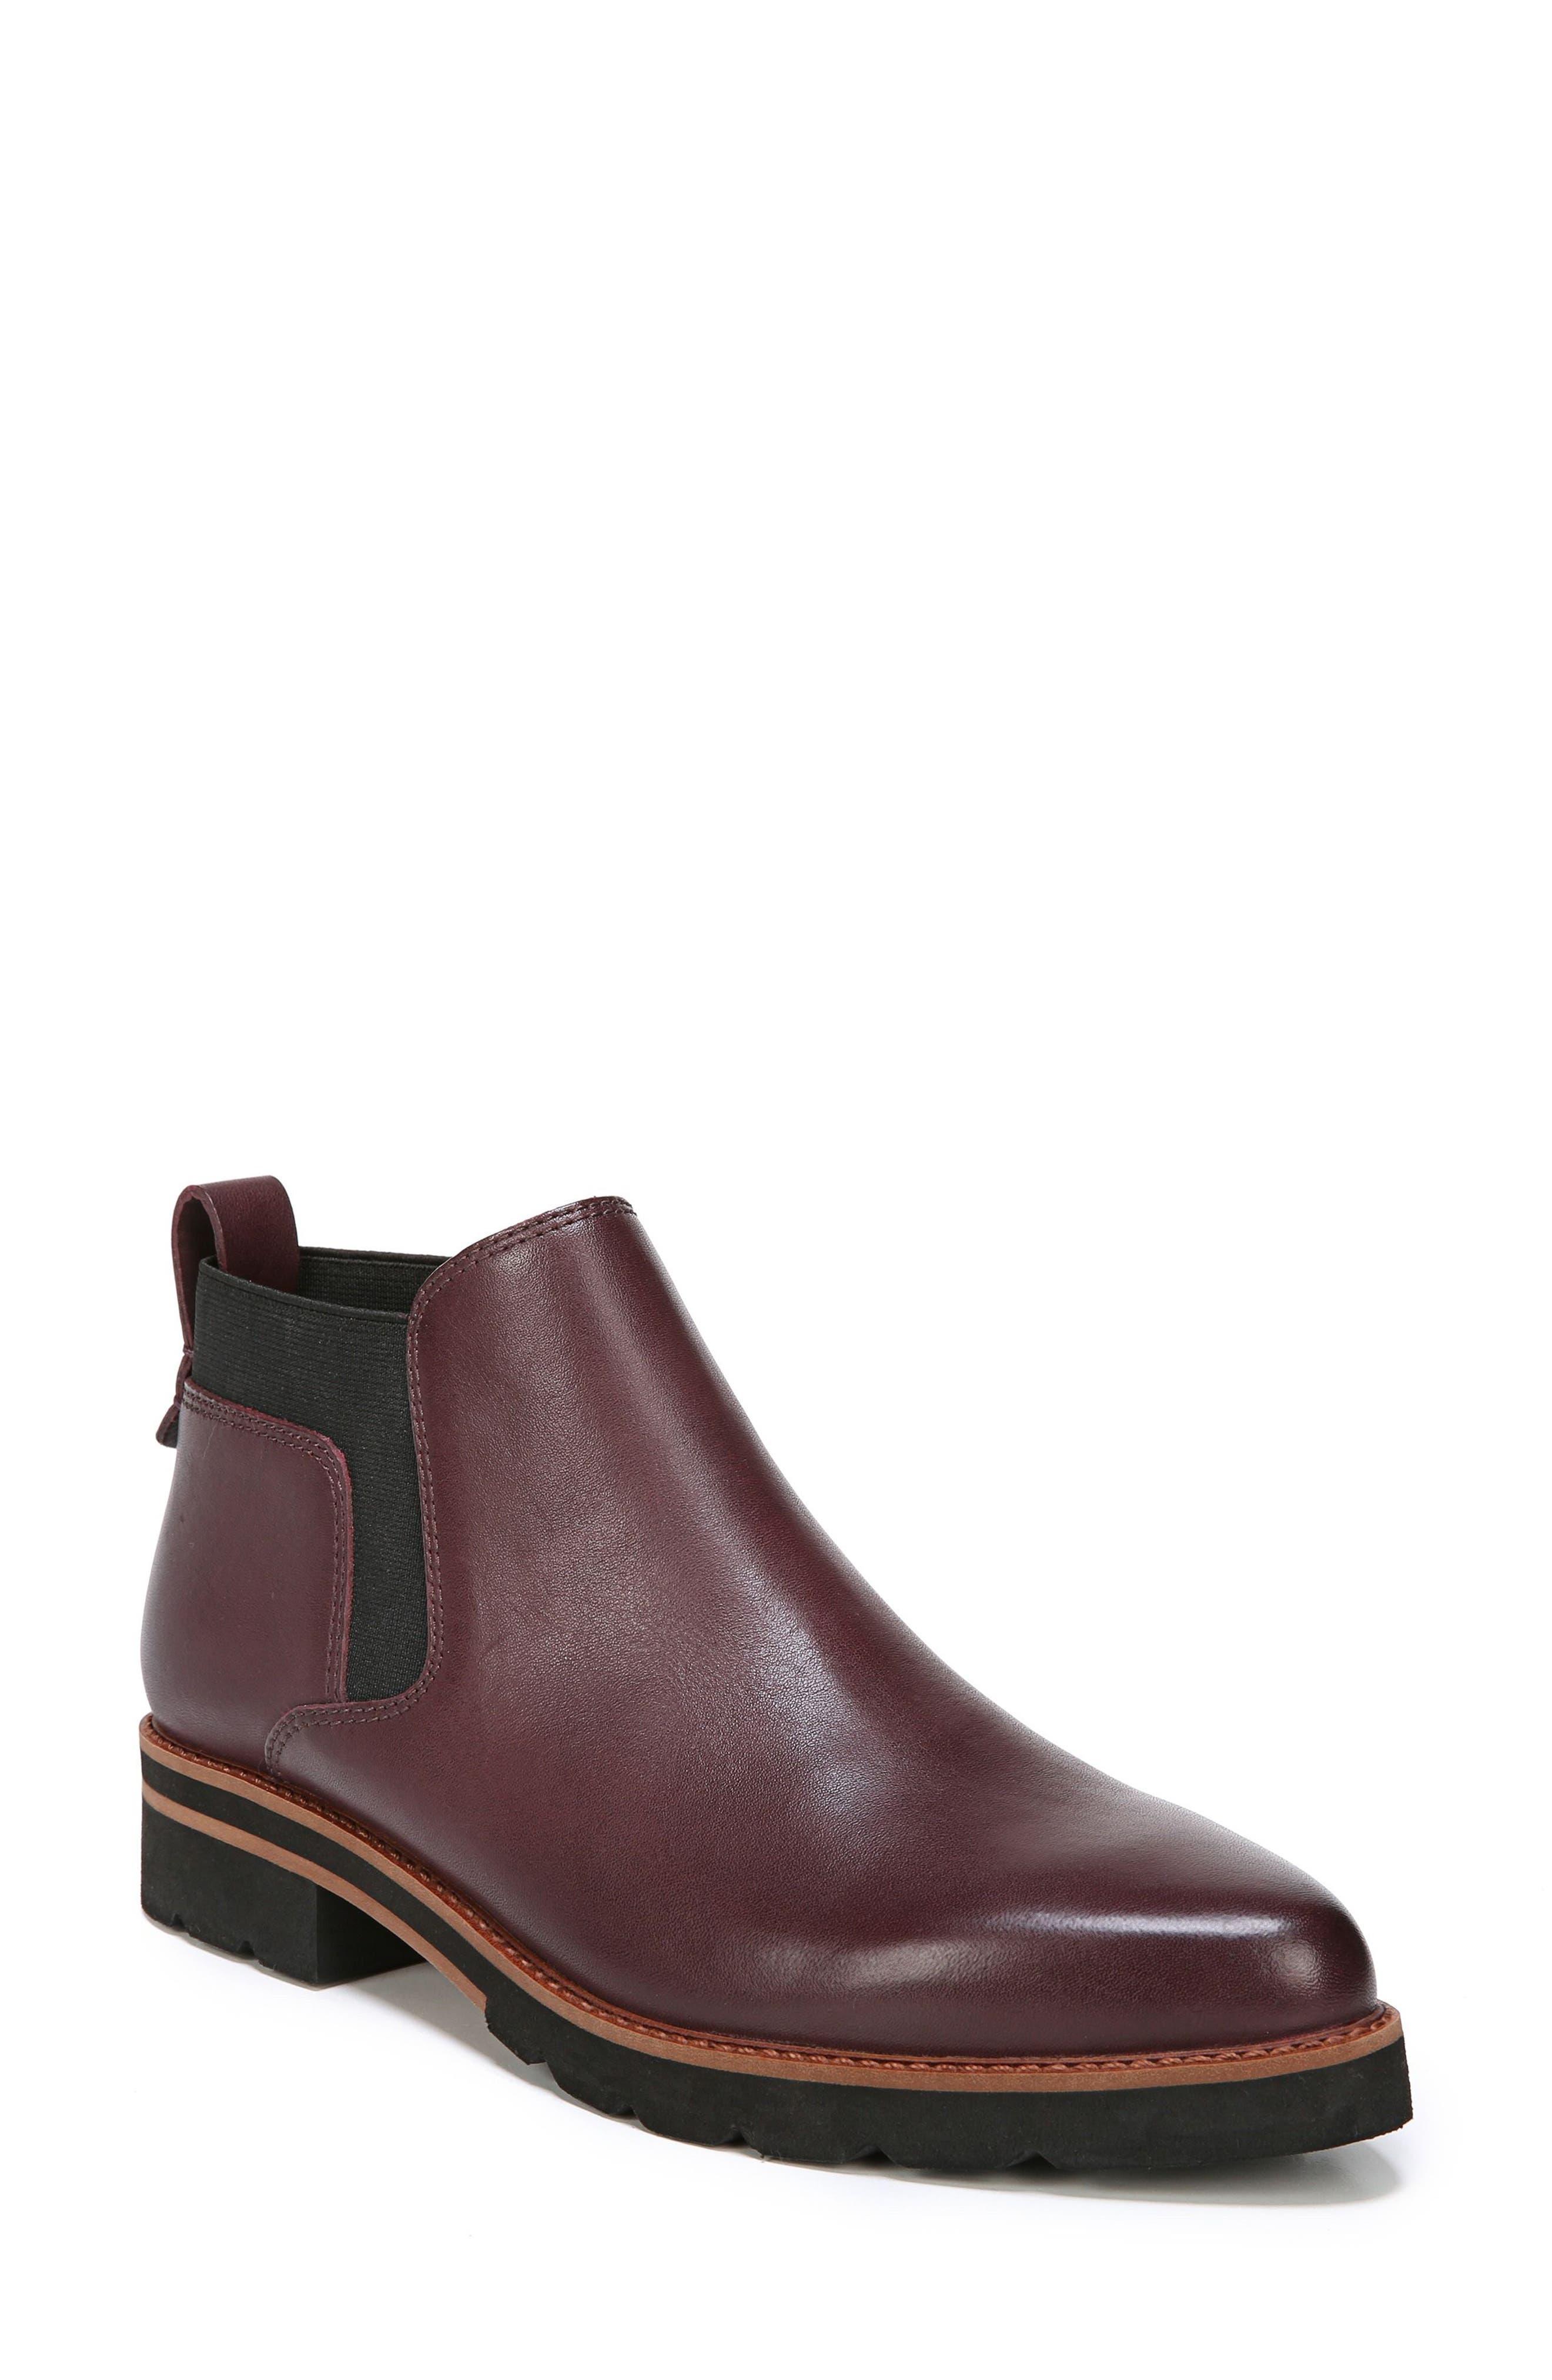 Bringham Bootie,                             Main thumbnail 1, color,                             Dark Burgundy Leather